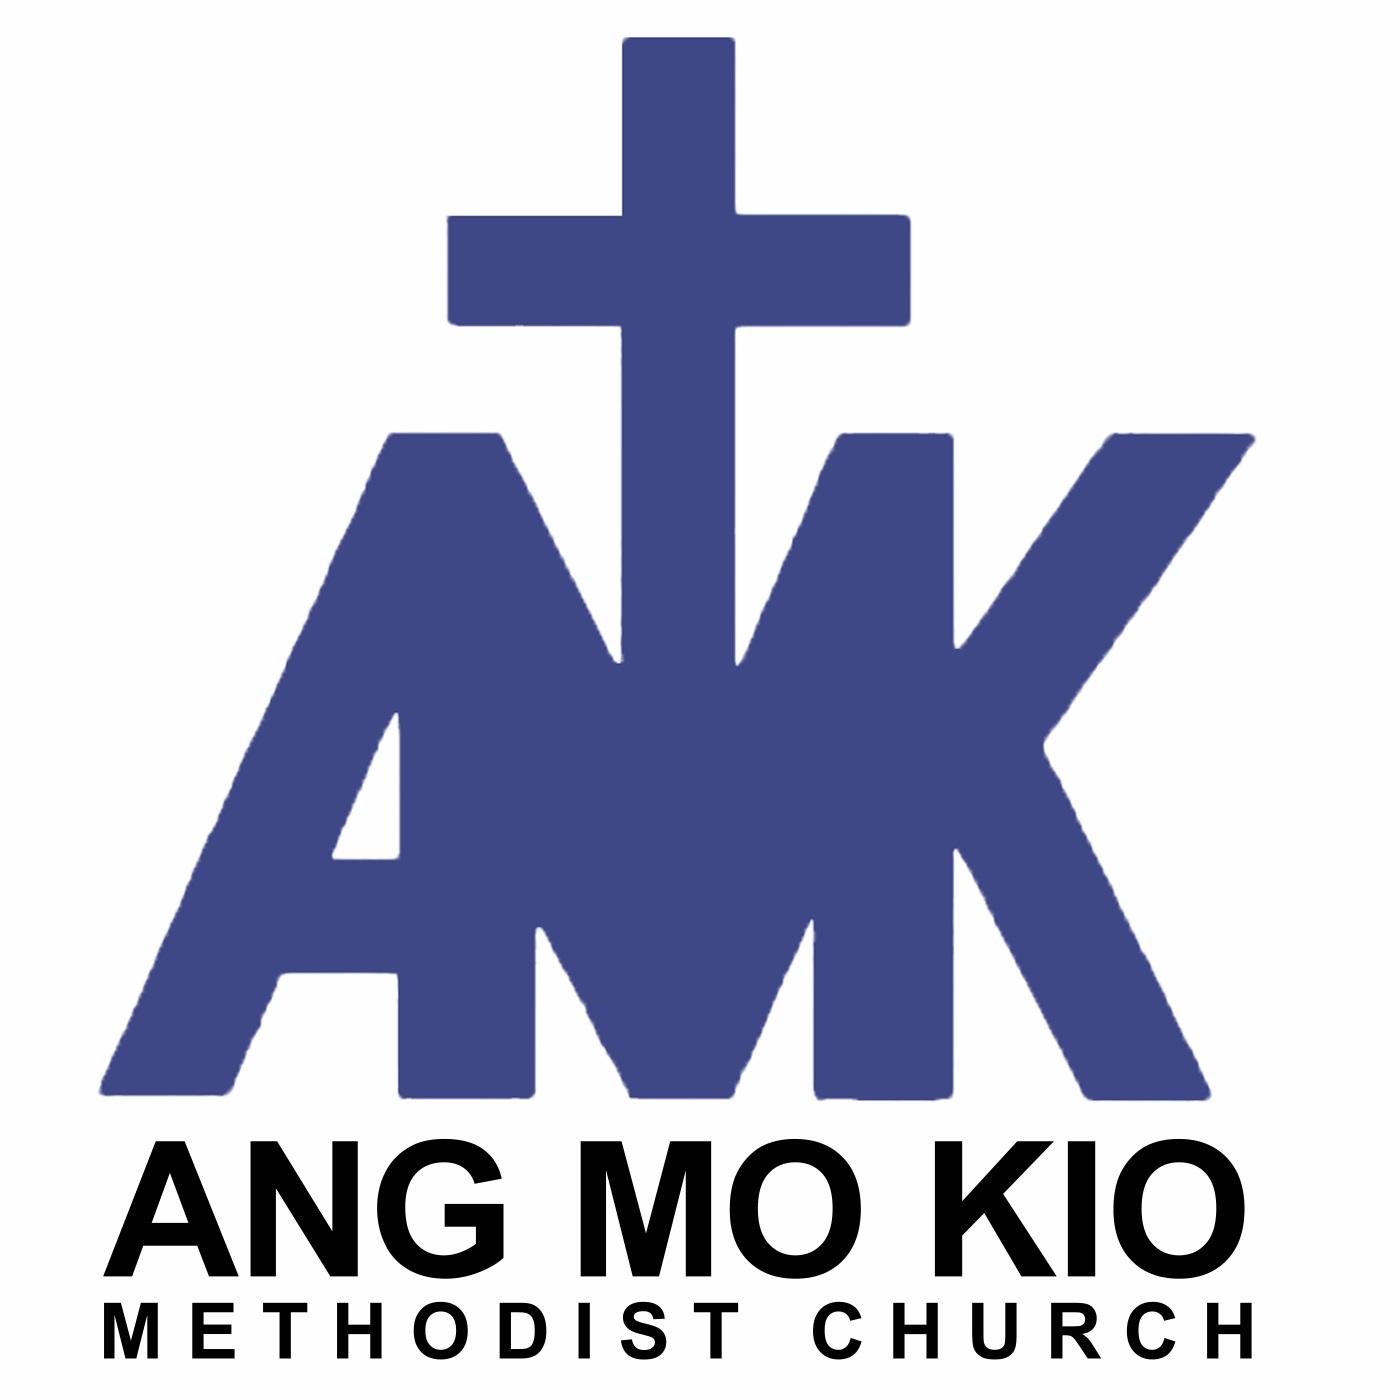 Ang Mo Kio Methodist Church (TRAC)